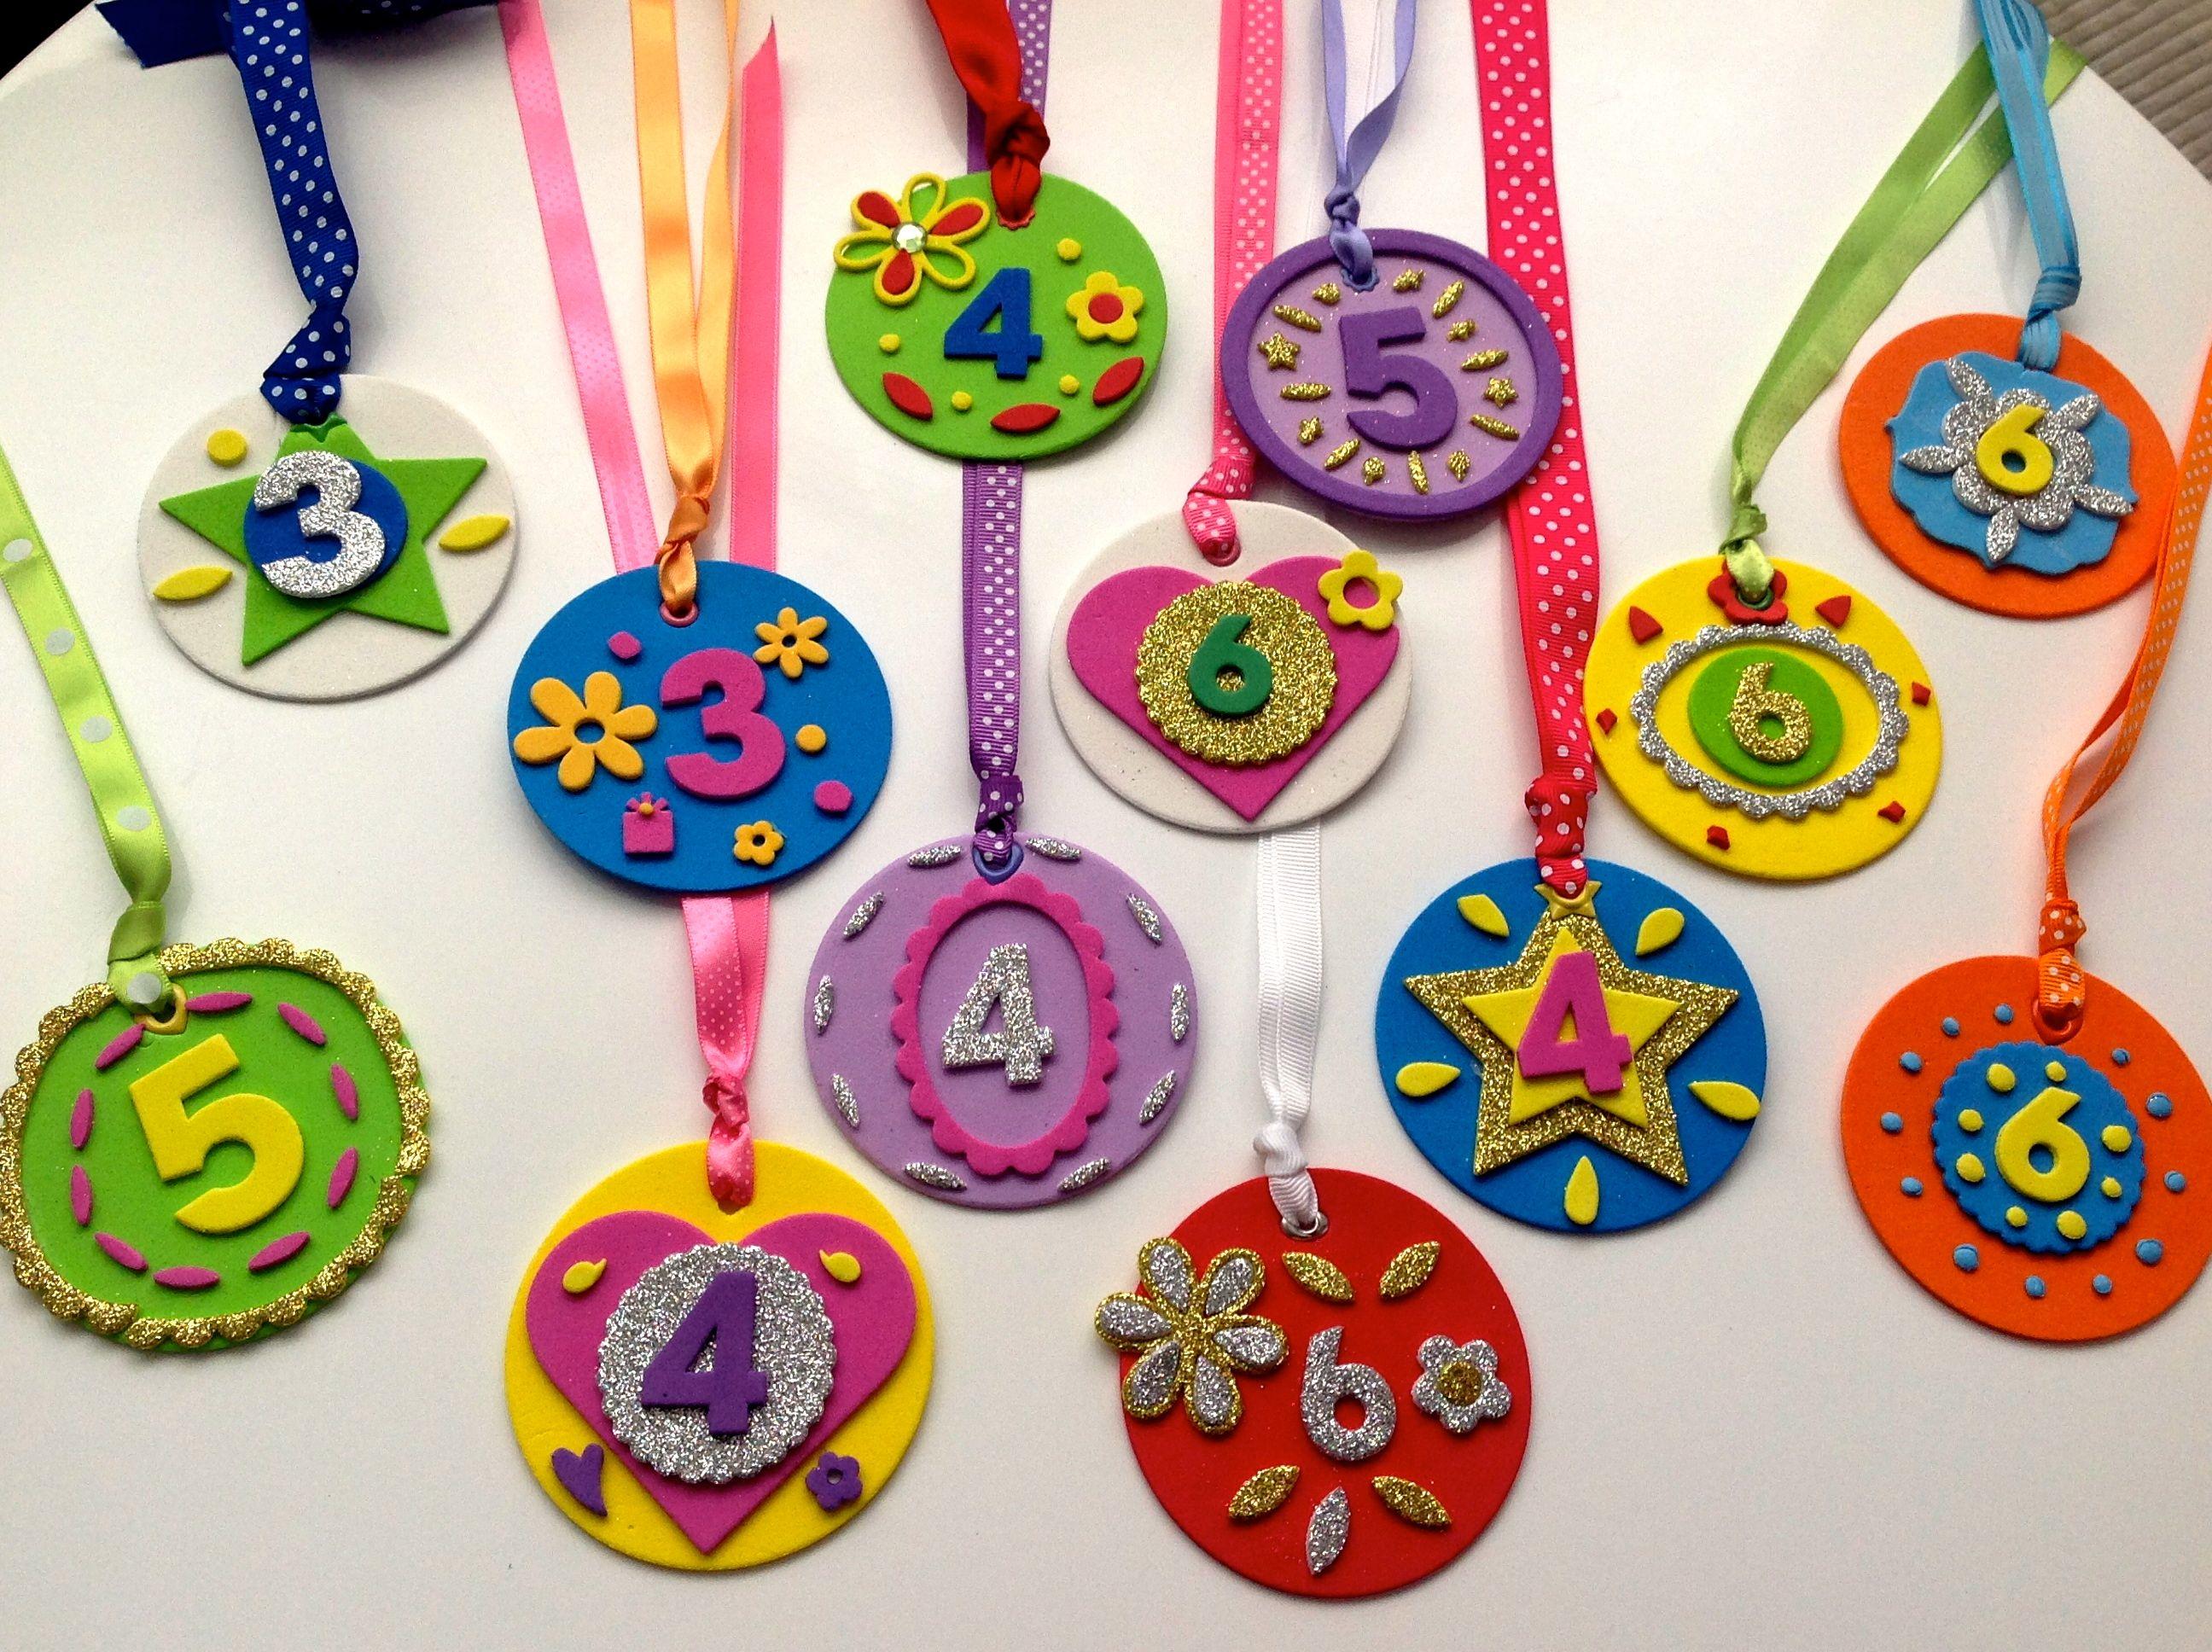 Medallas cumplea±os Celebraciones Pinterest